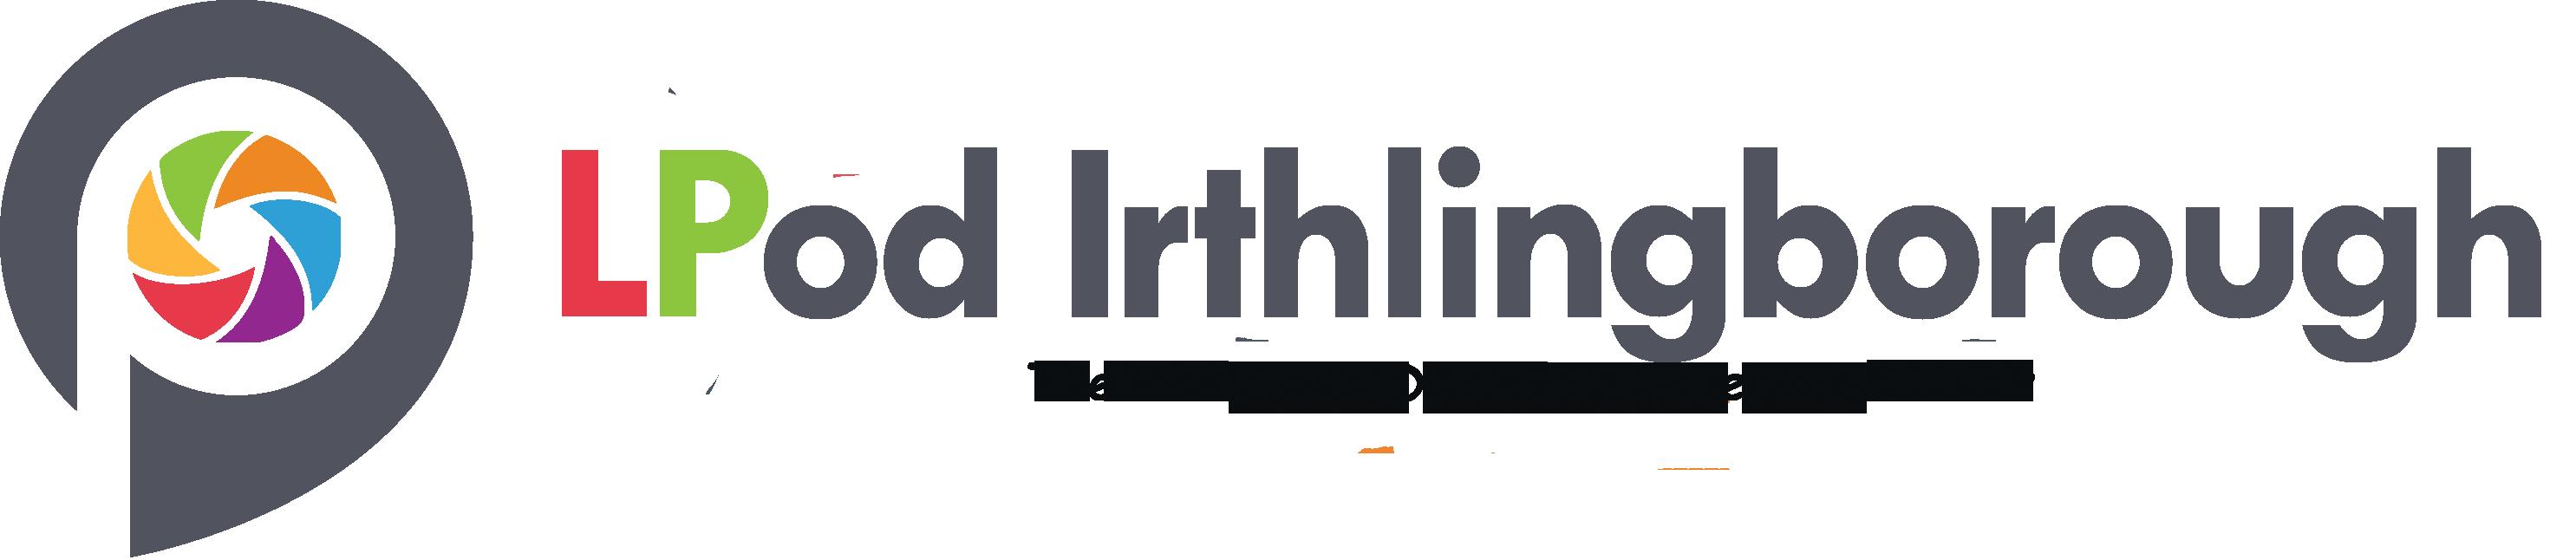 intensive driving courses irthlingborough